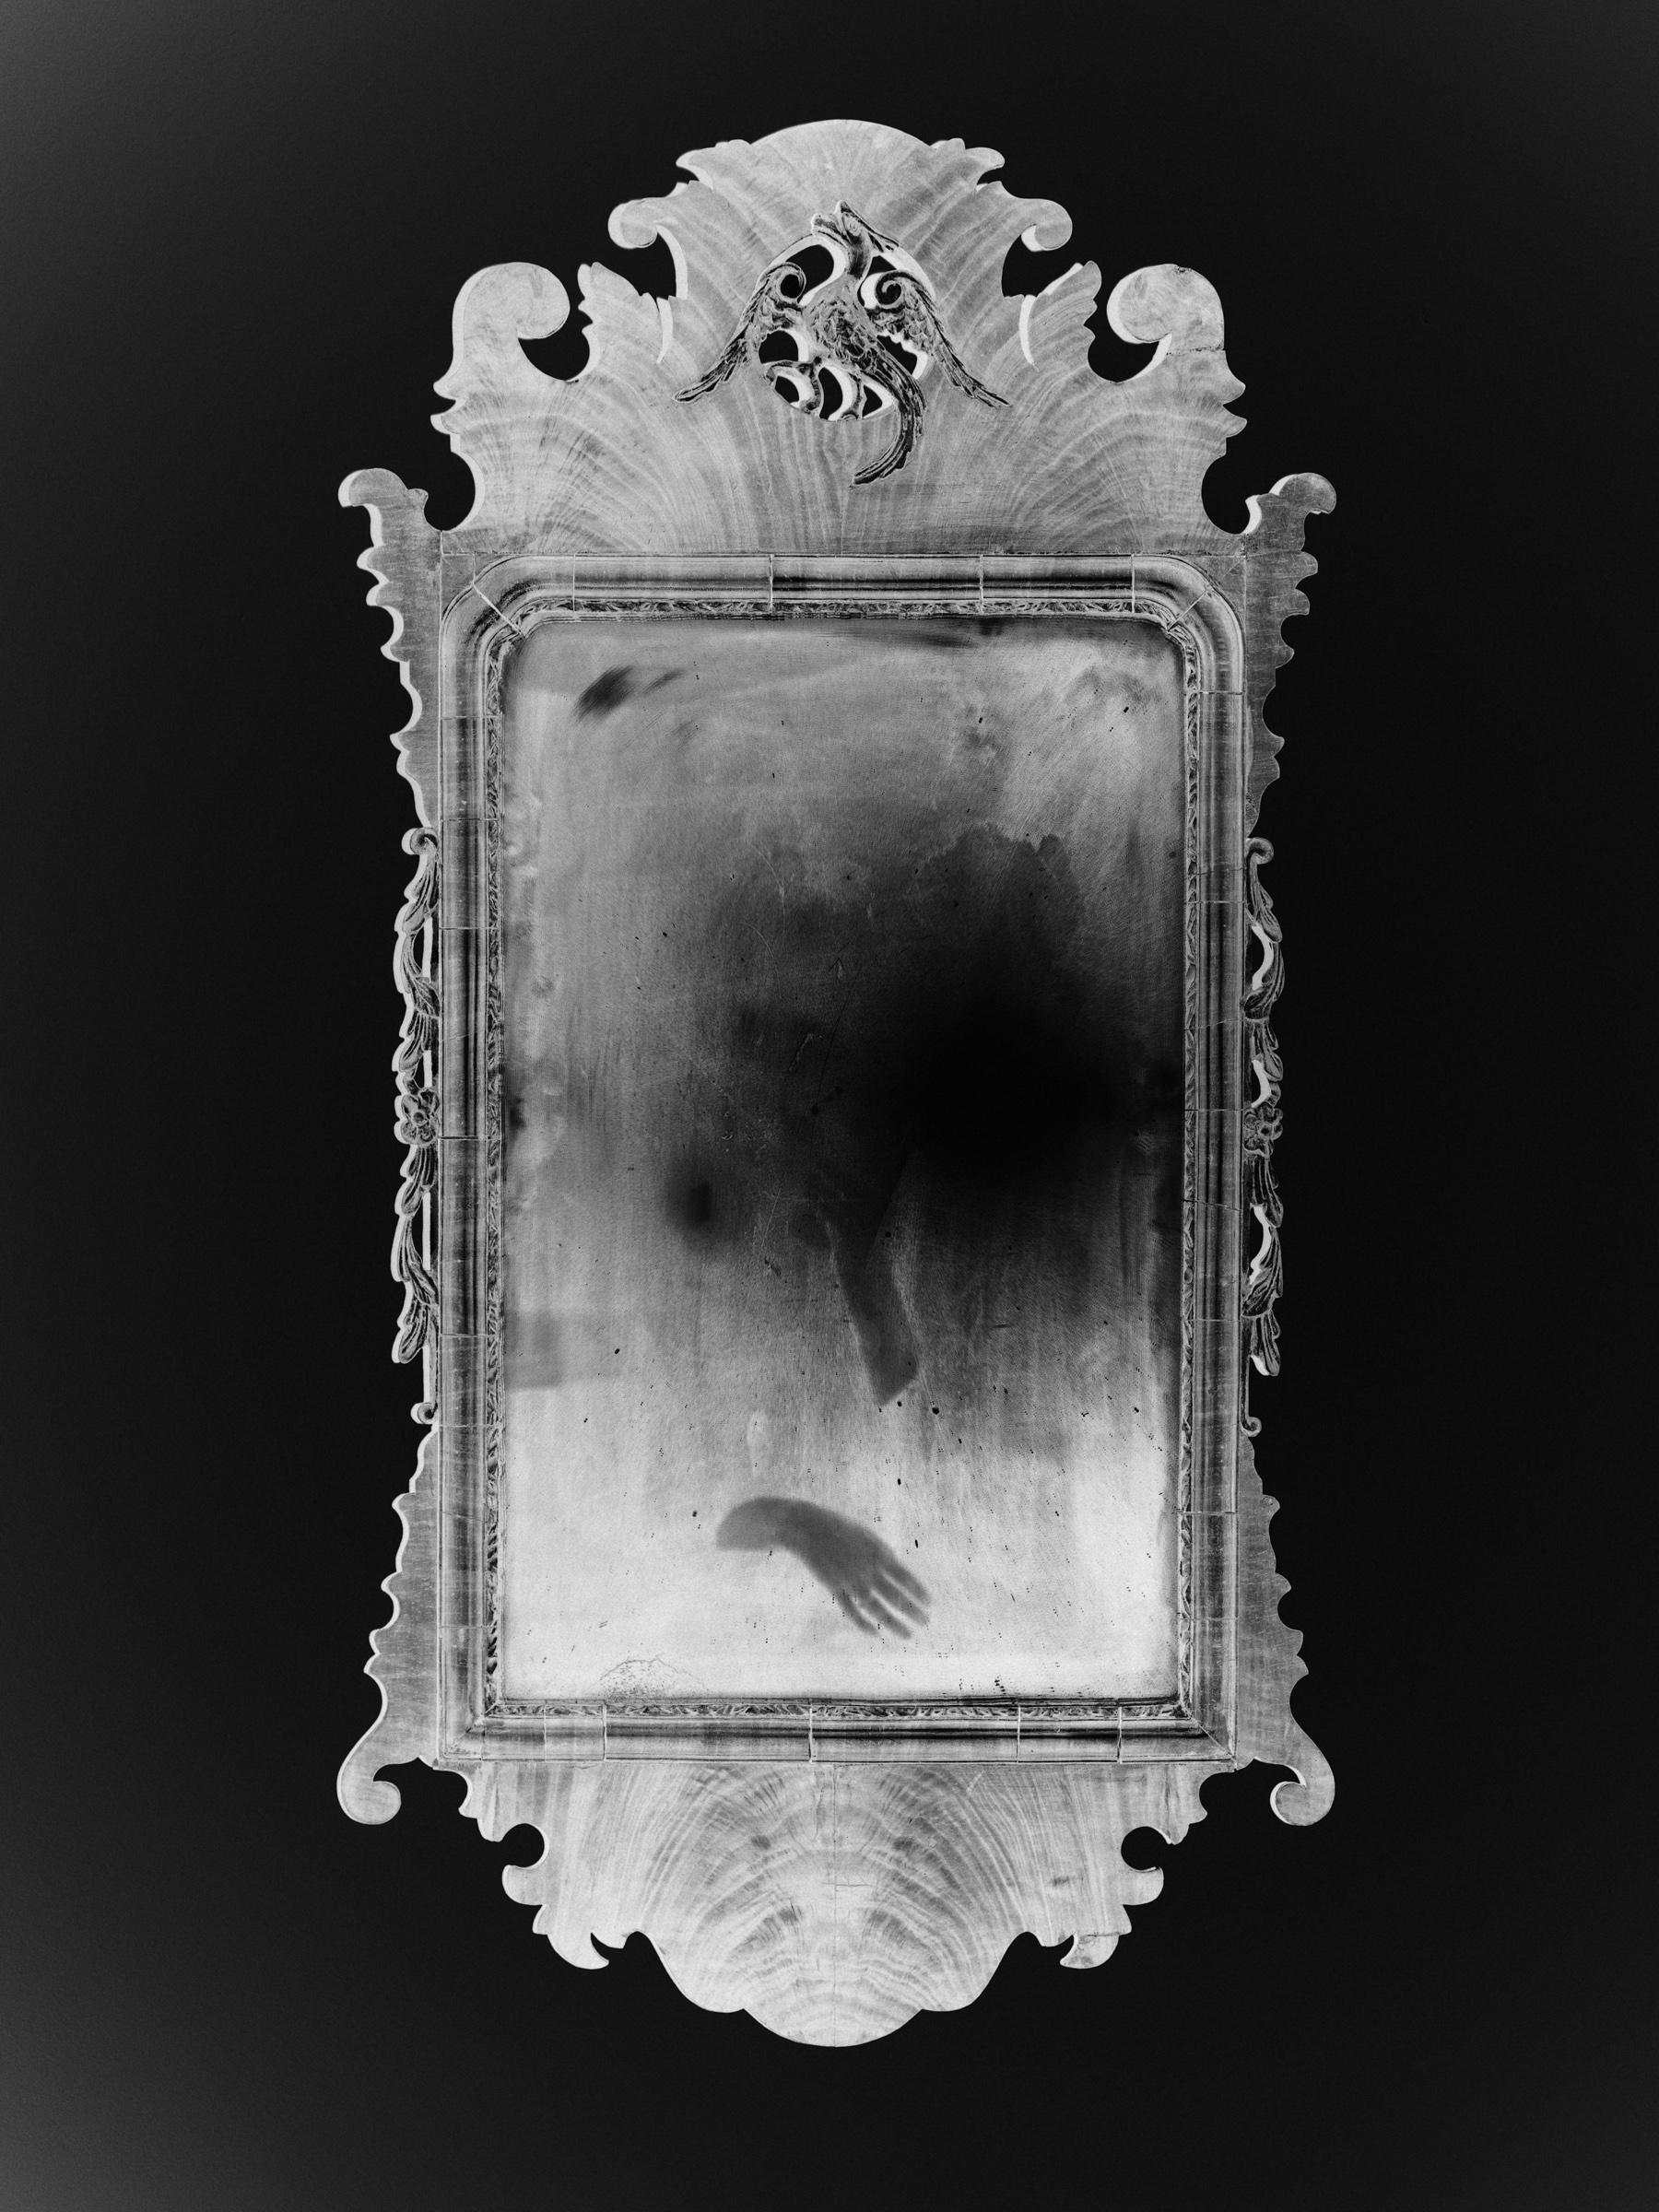 Tereza Zelenkova, Bedroom Mirror, Campbell House, 2020. Courtesy of the artist and Ravestijn Gallery, Amsterdam